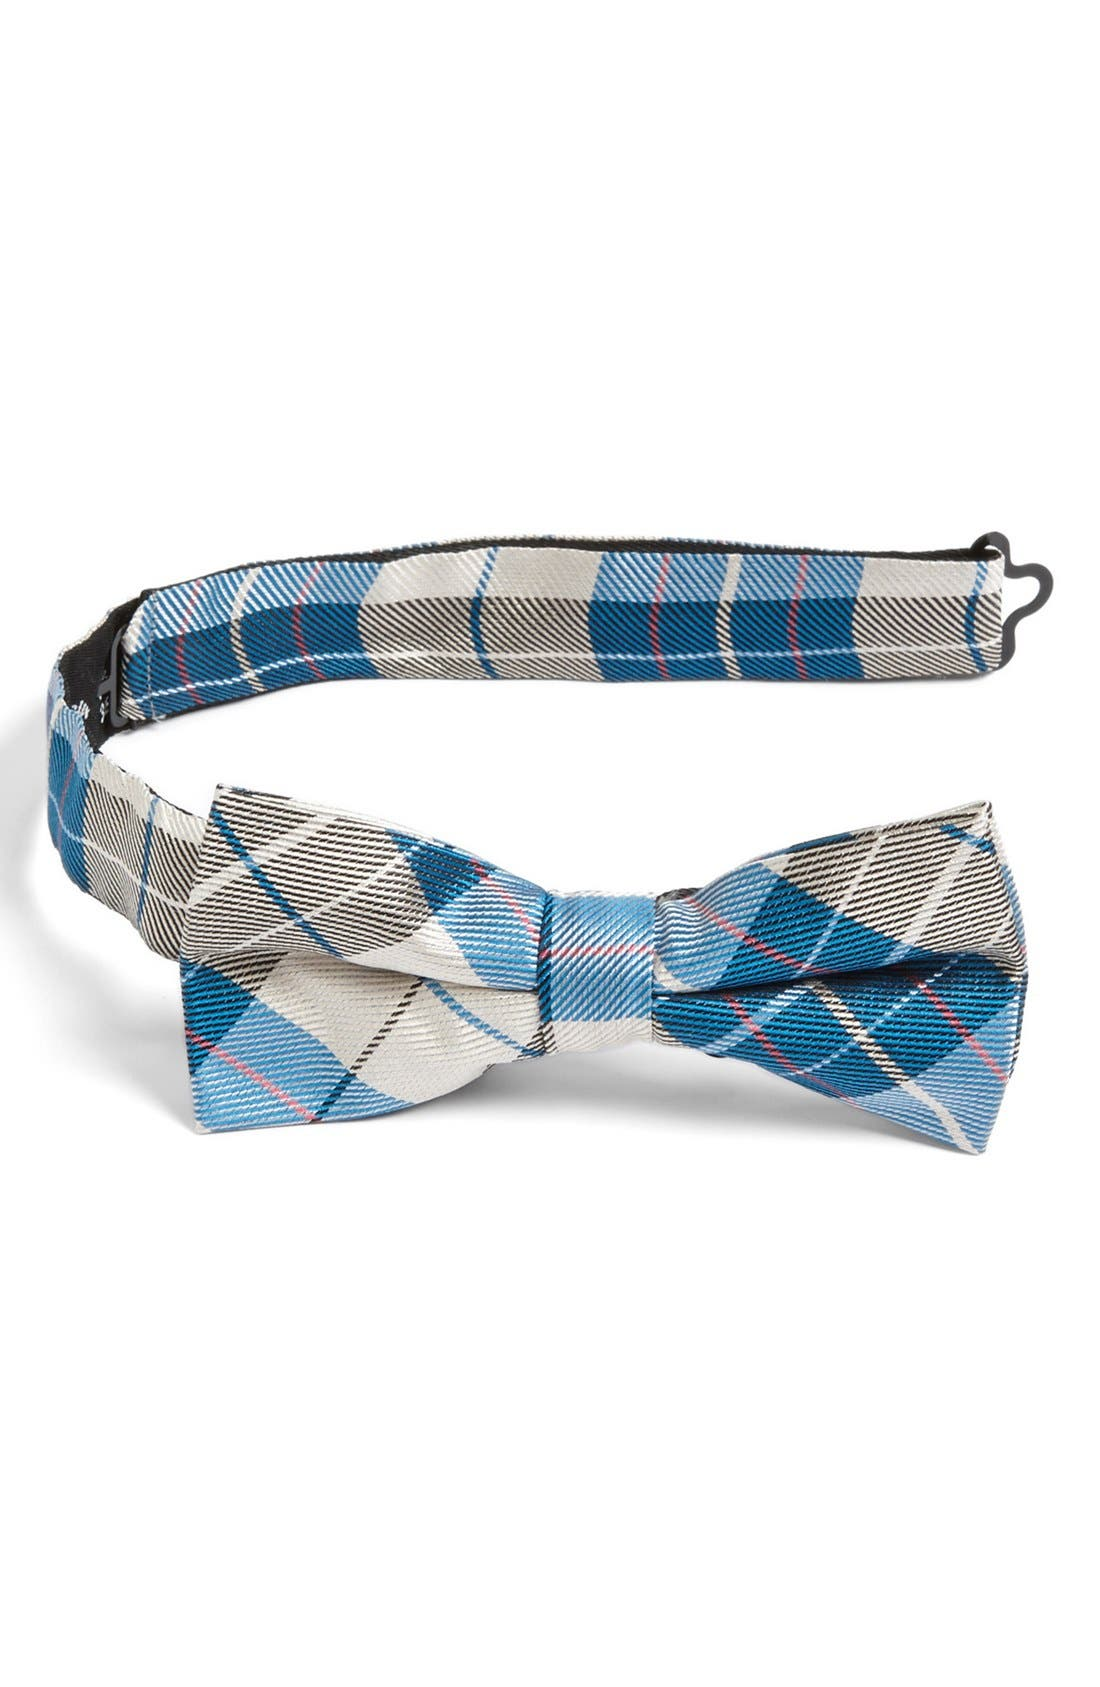 Alternate Image 1 Selected - 1901 Silk Bow Tie